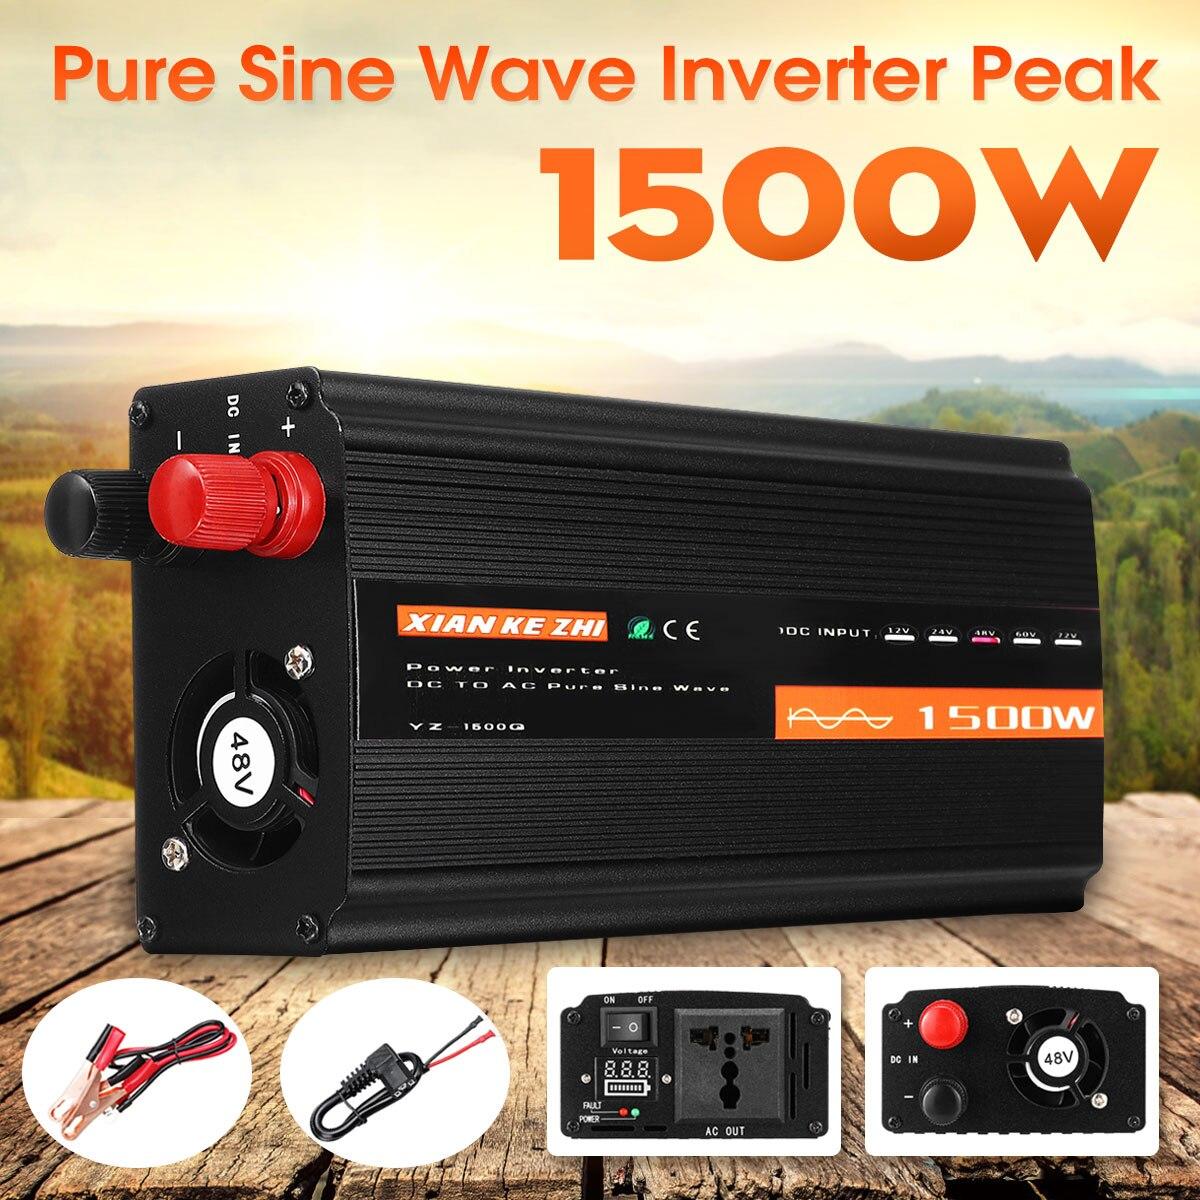 Ultimate SaleInverter 1500W 12v 220v Pure To for Household DIY Truck Car 24V/48V